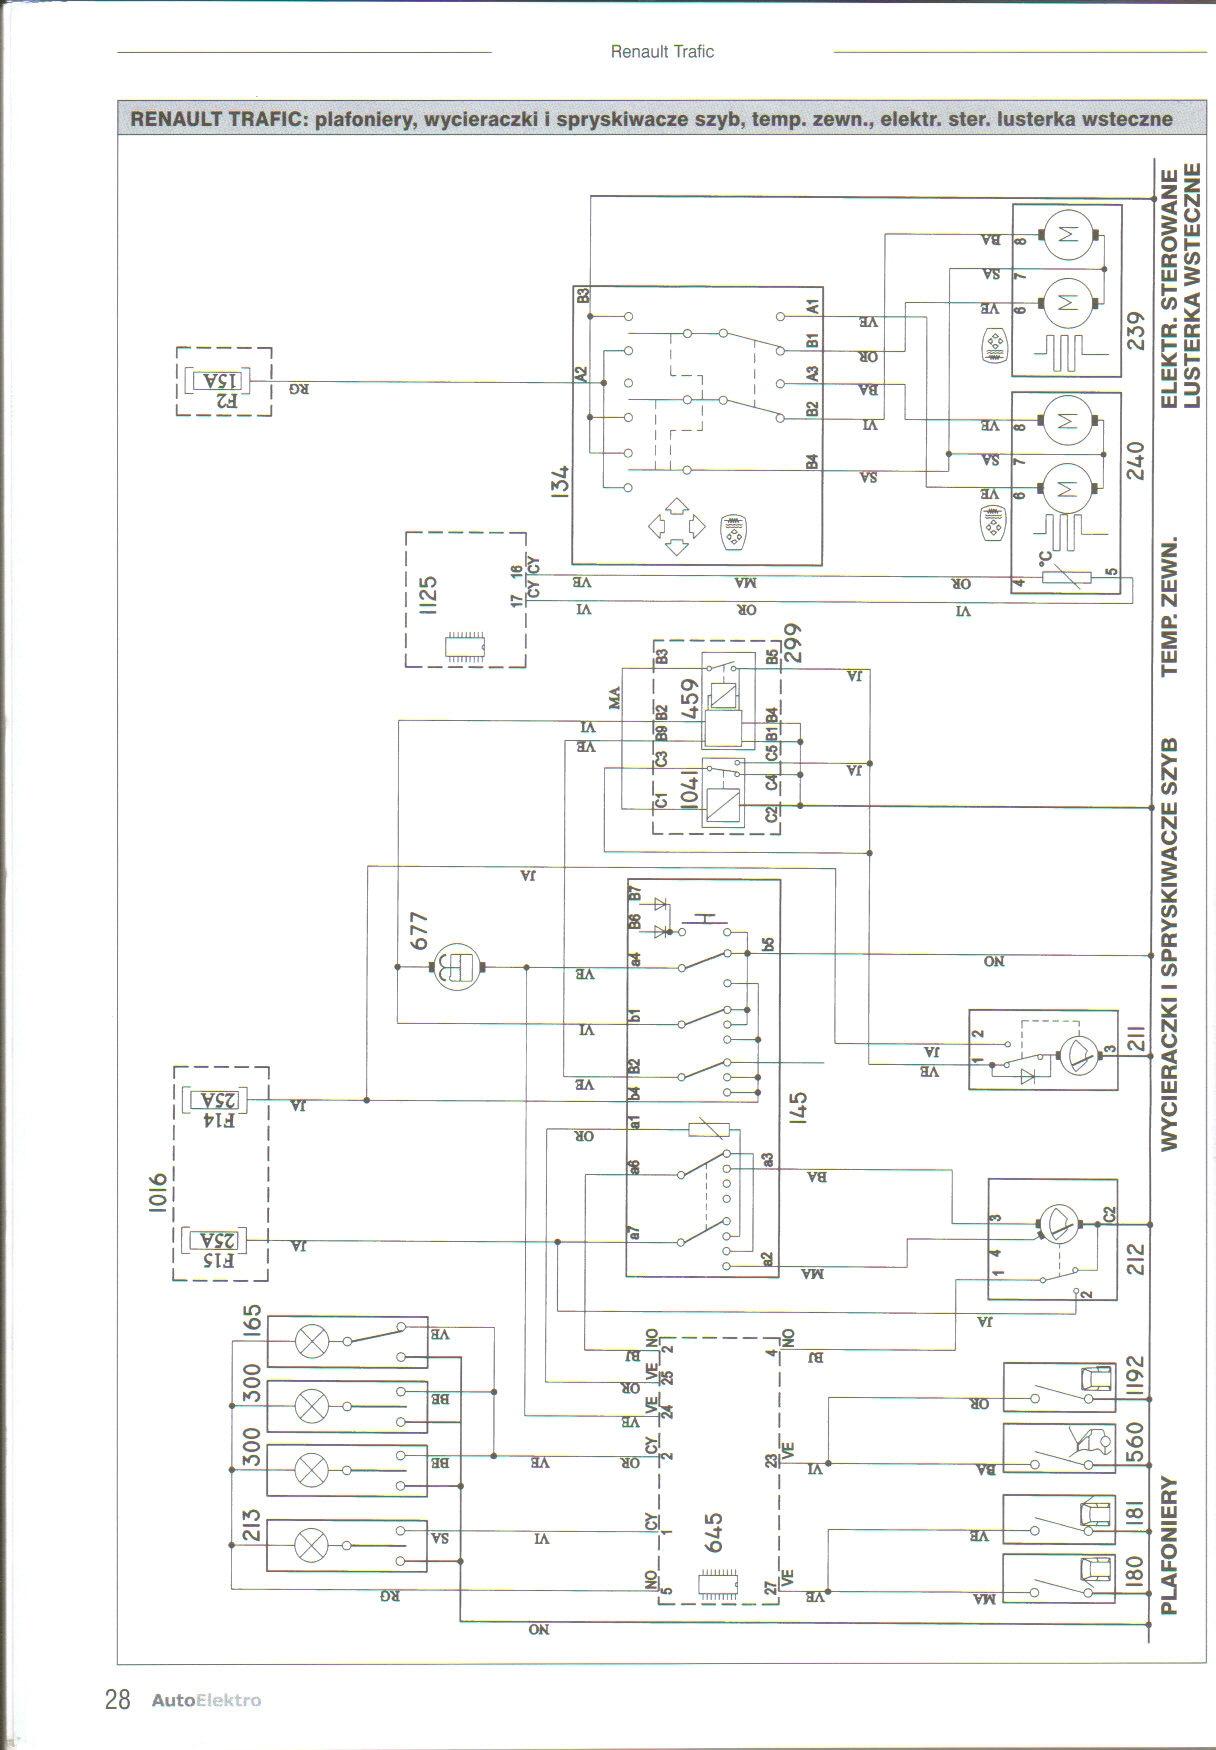 Vauxhall vivaro wiring diagram 30 wiring diagram images www renault trafic rear light wiring diagram k asfbconference2016 Images